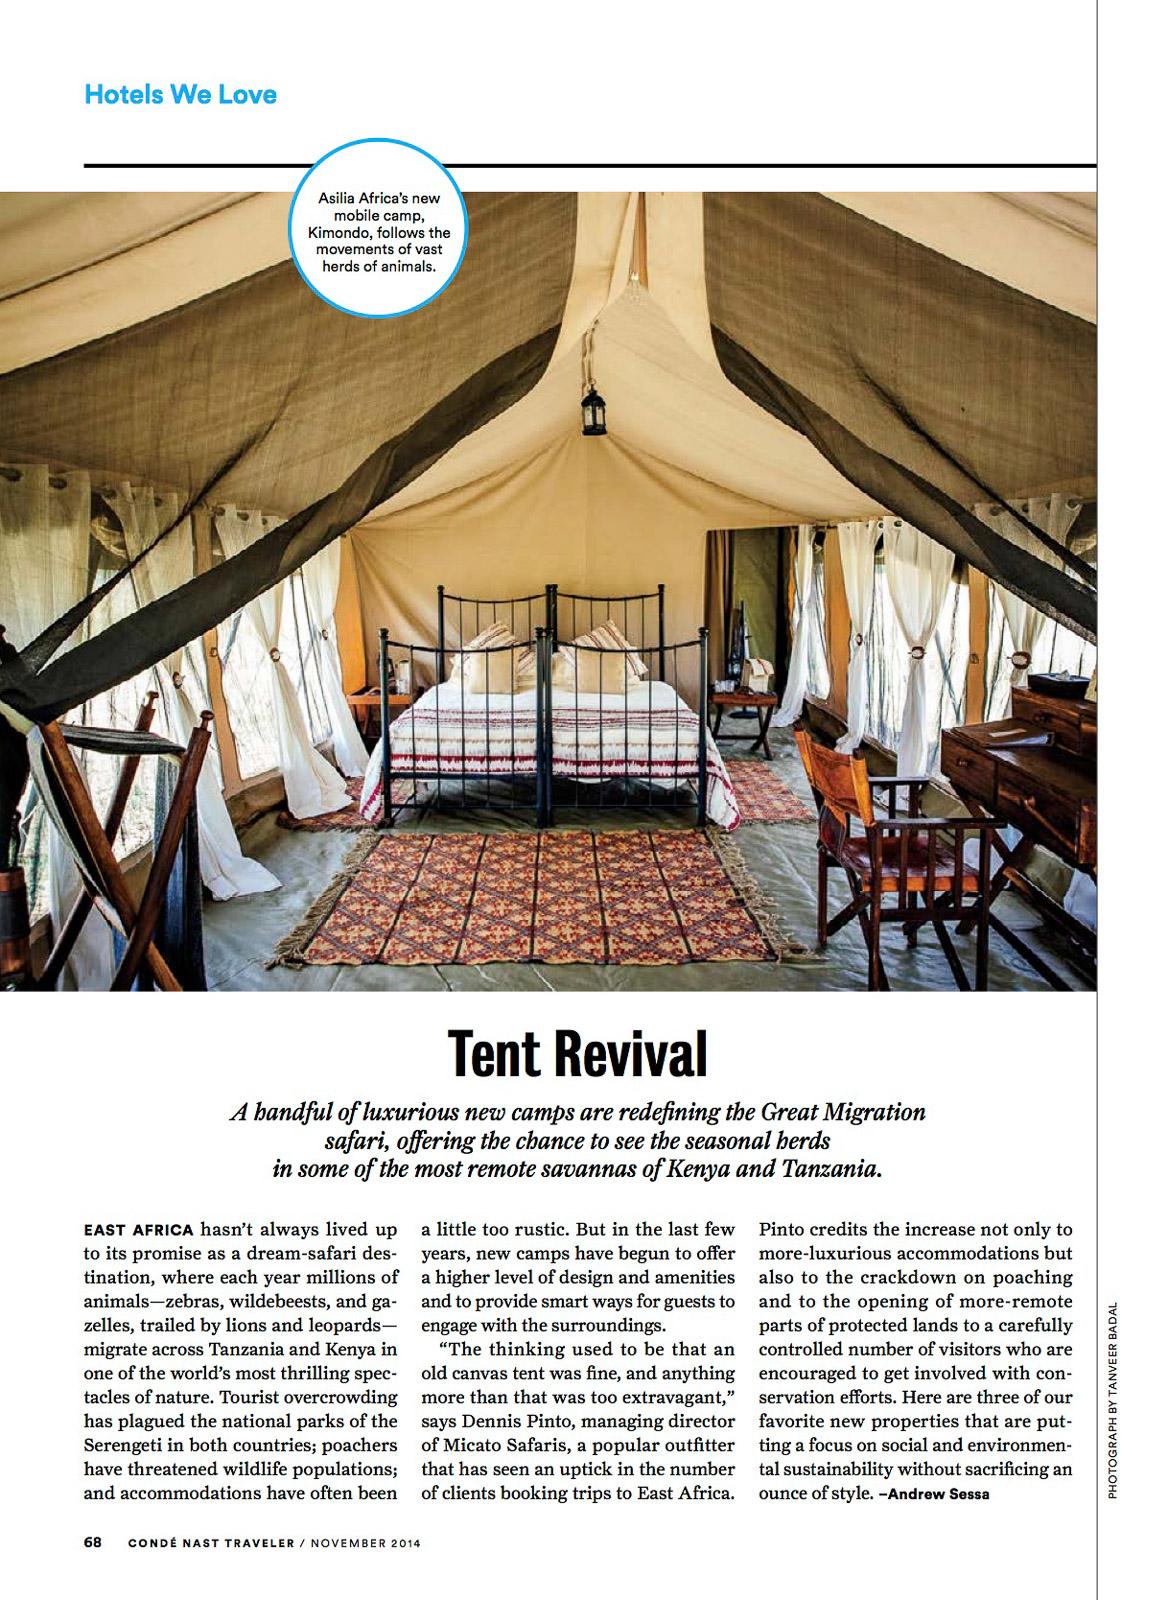 Condé Nast Traveler (US) - Tent Revival